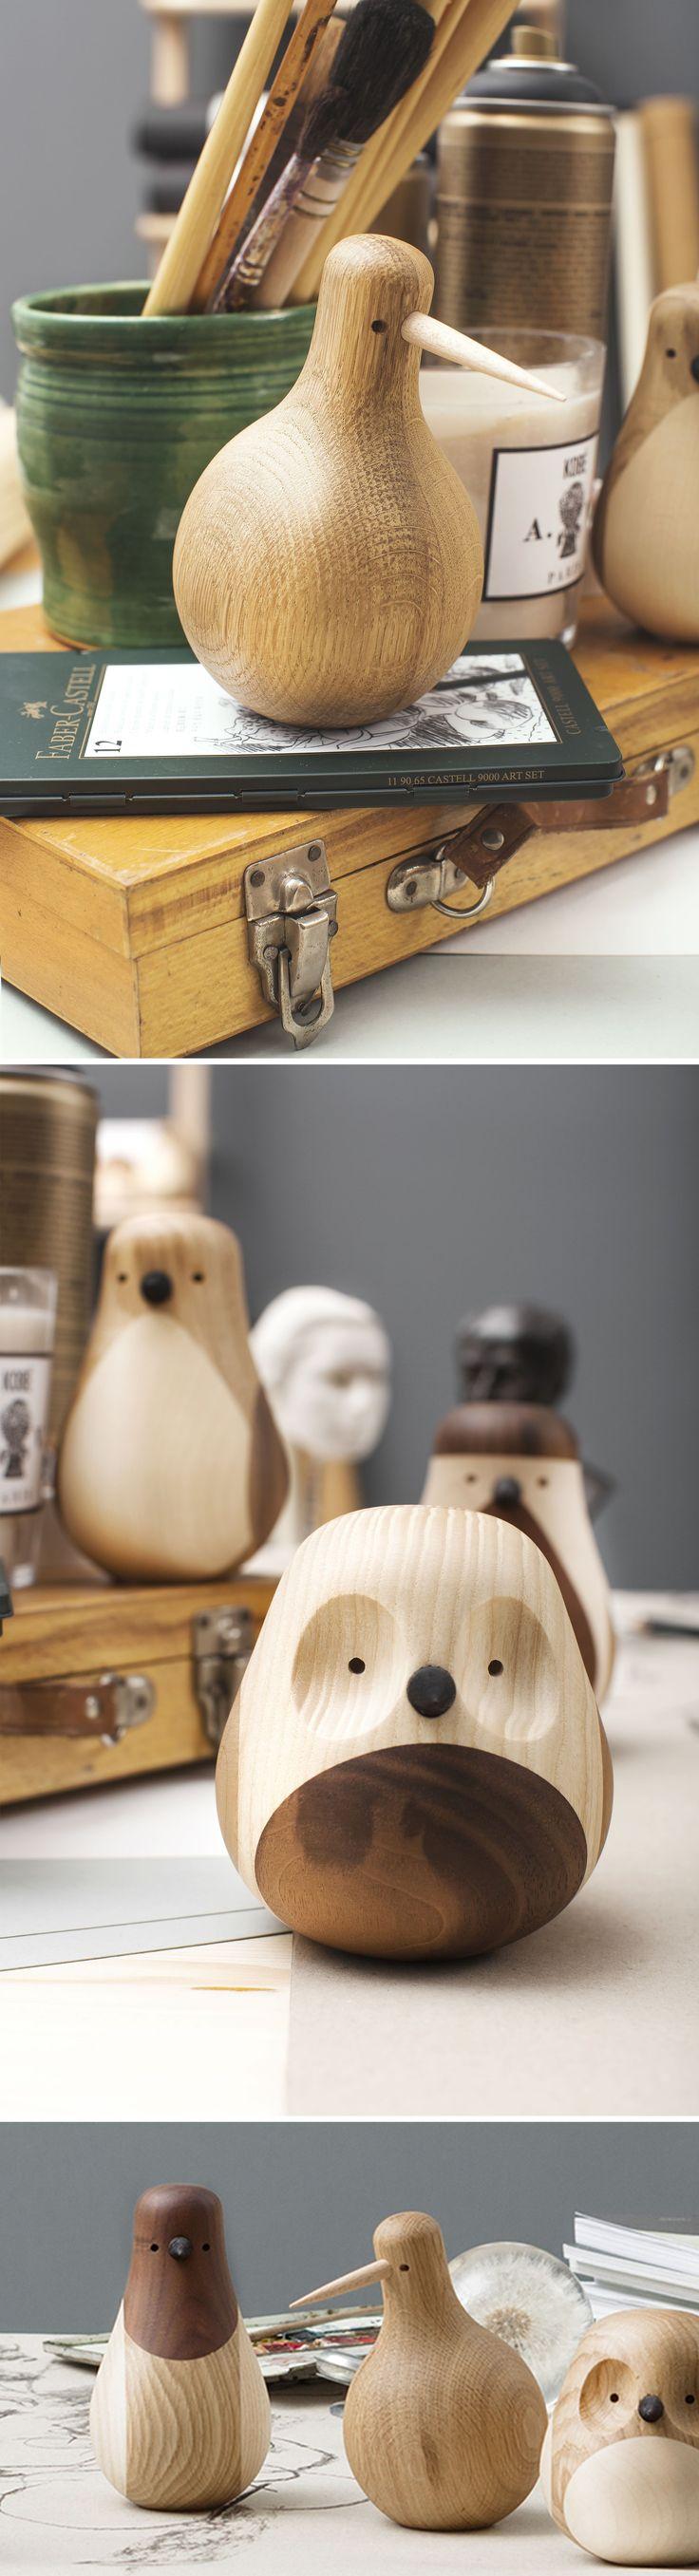 Hunting for tips regarding wood working? http://www.woodesigner.net provides them!